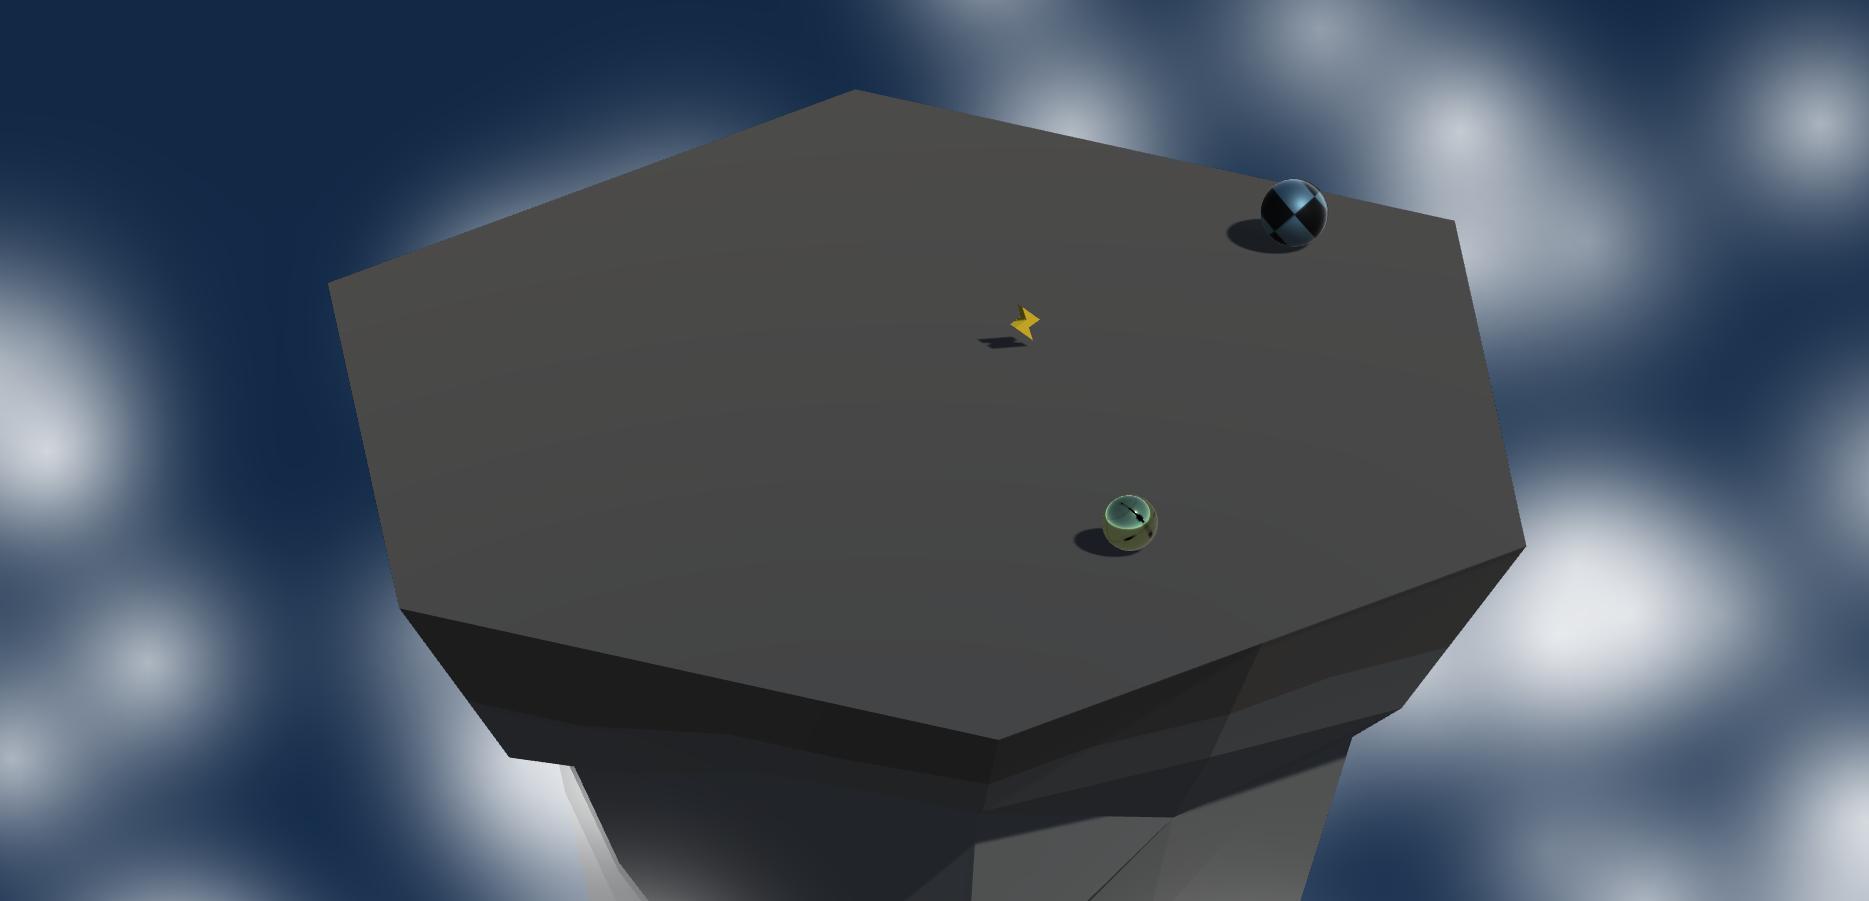 Sumo Spheres